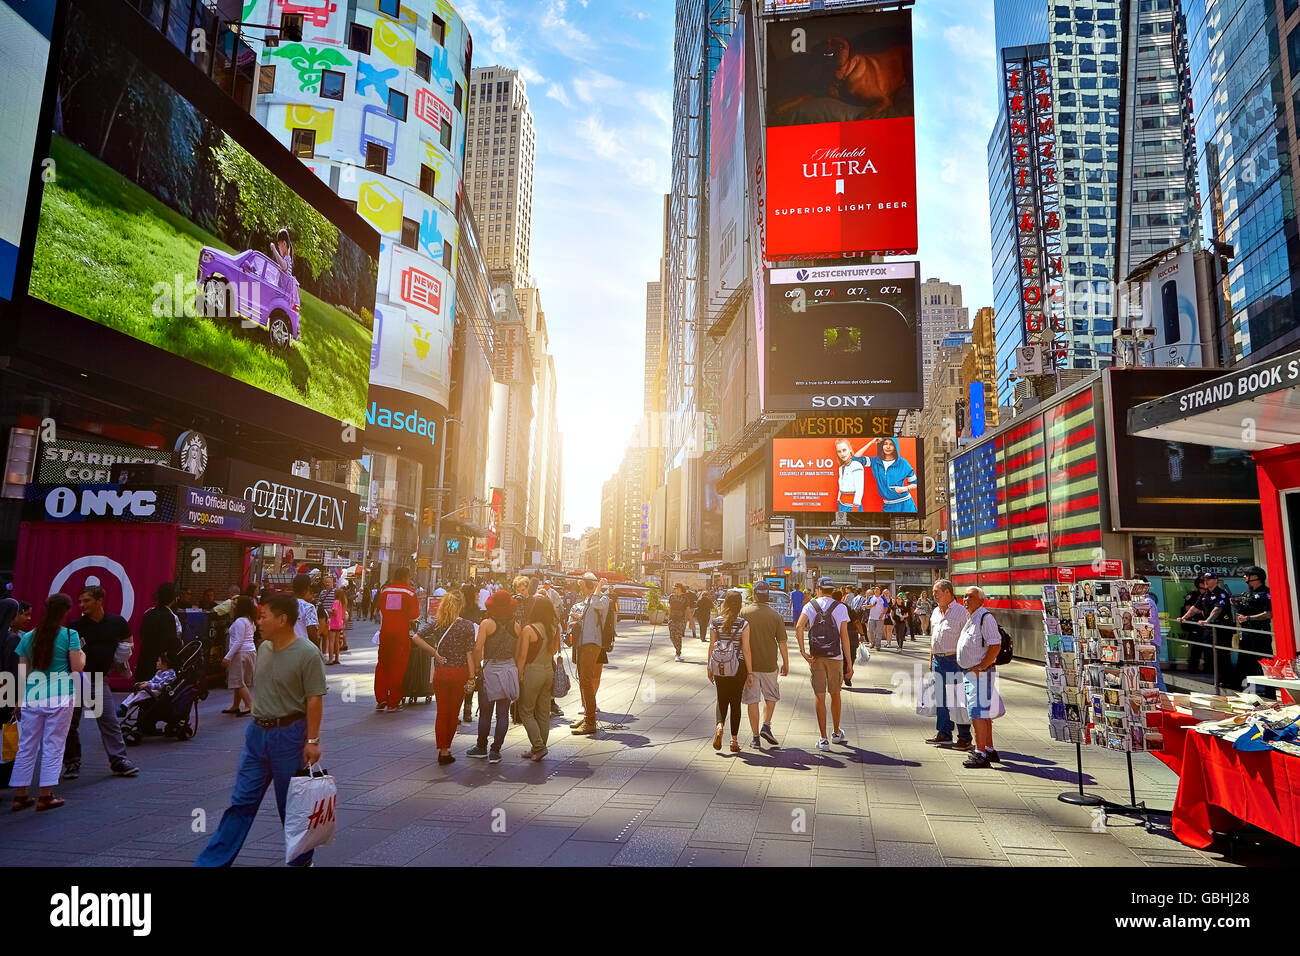 NEW YORK CITY - JUNE 14, 2016: Times Square. USA Stock Photo